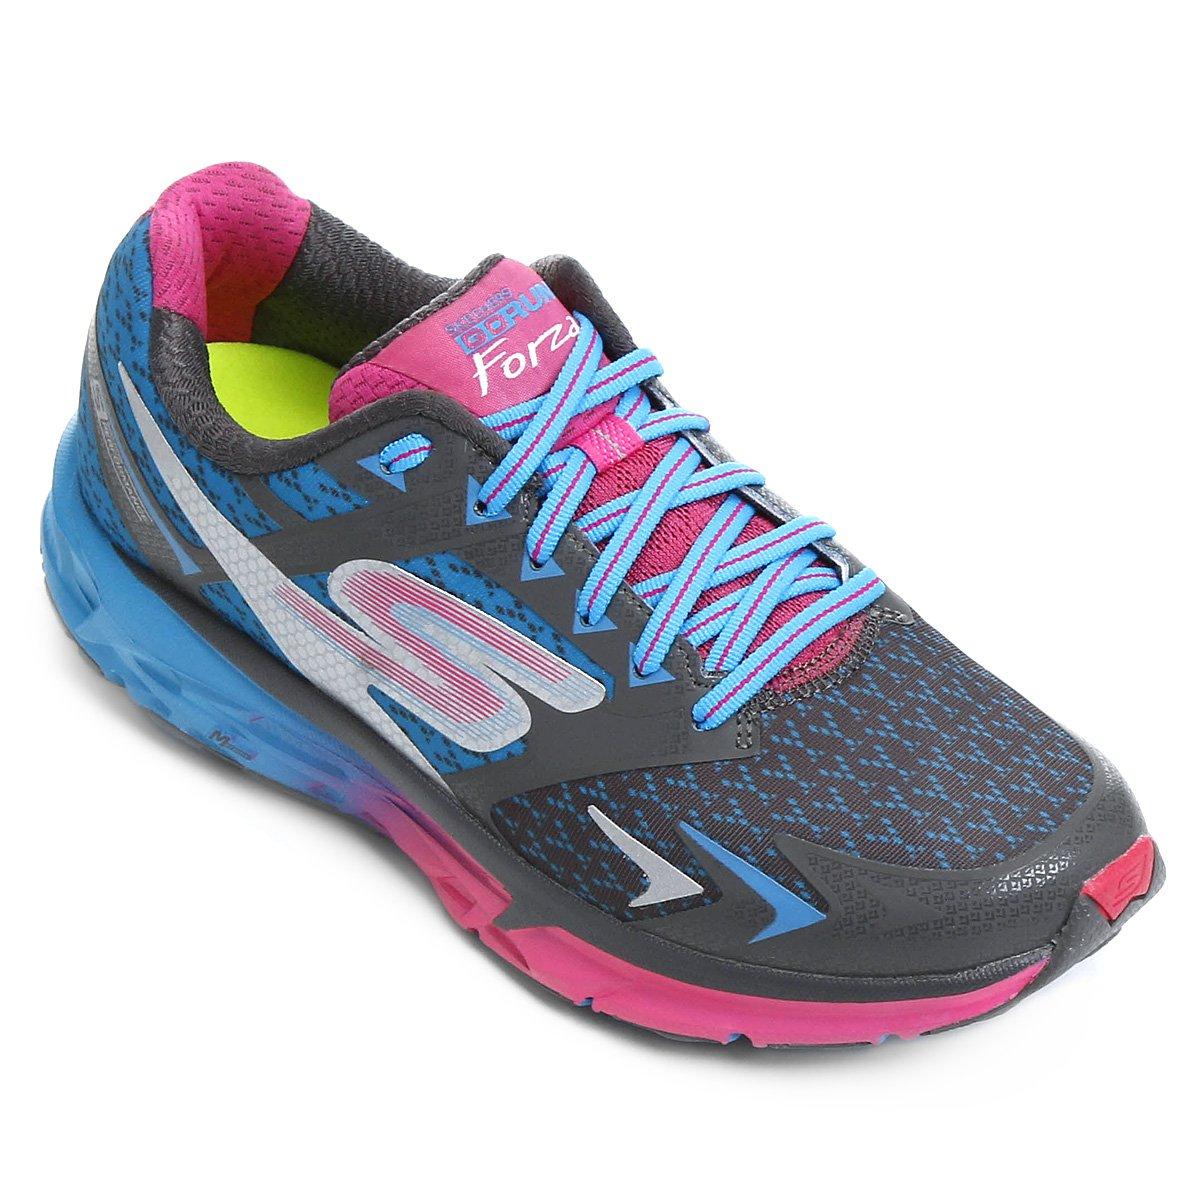 Tênis Skechers Go Run Forza Feminino - Compre Agora  472d3ebb47e84